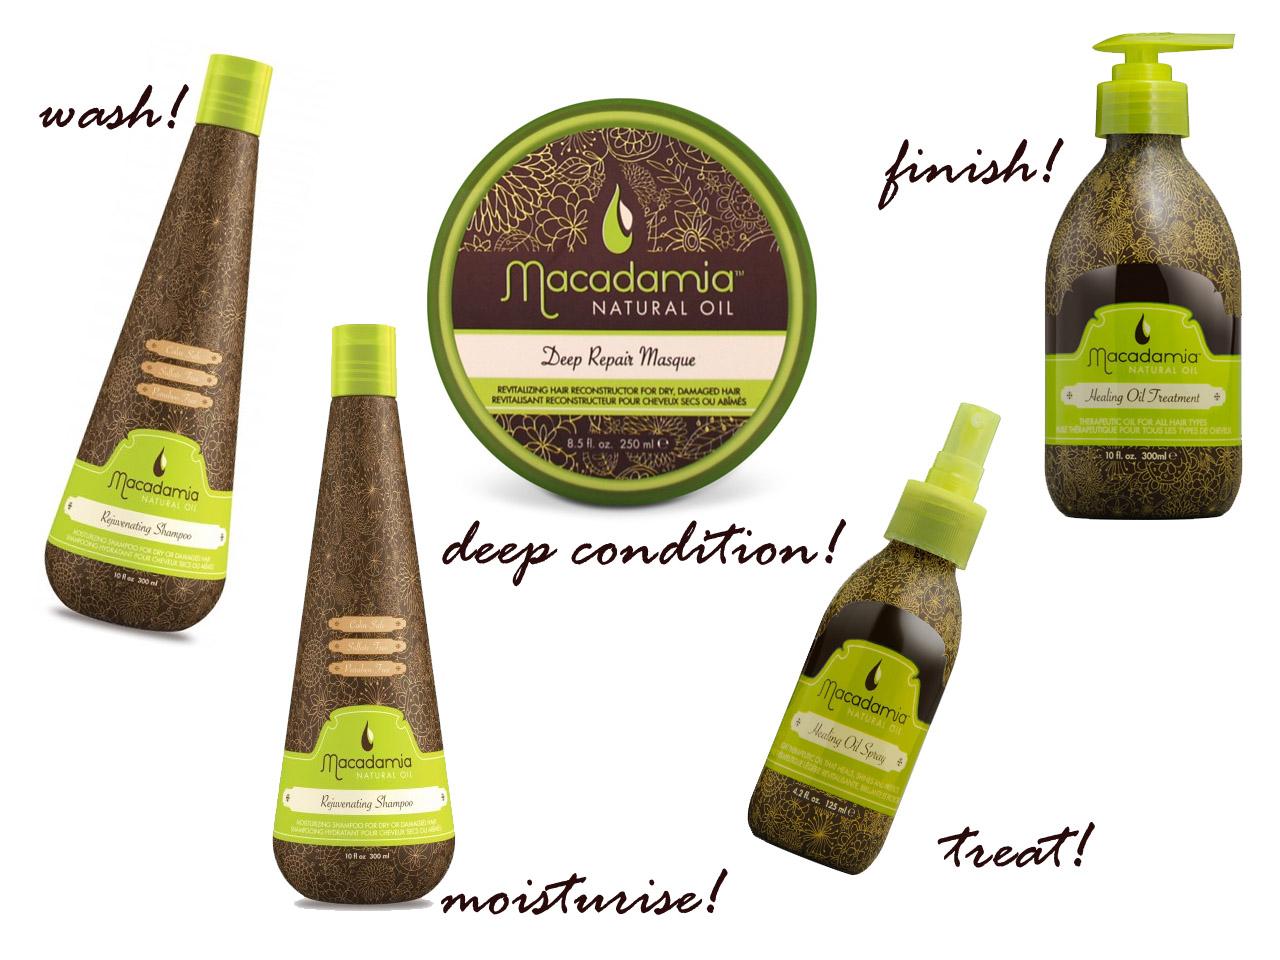 Macadamia Hair porducts